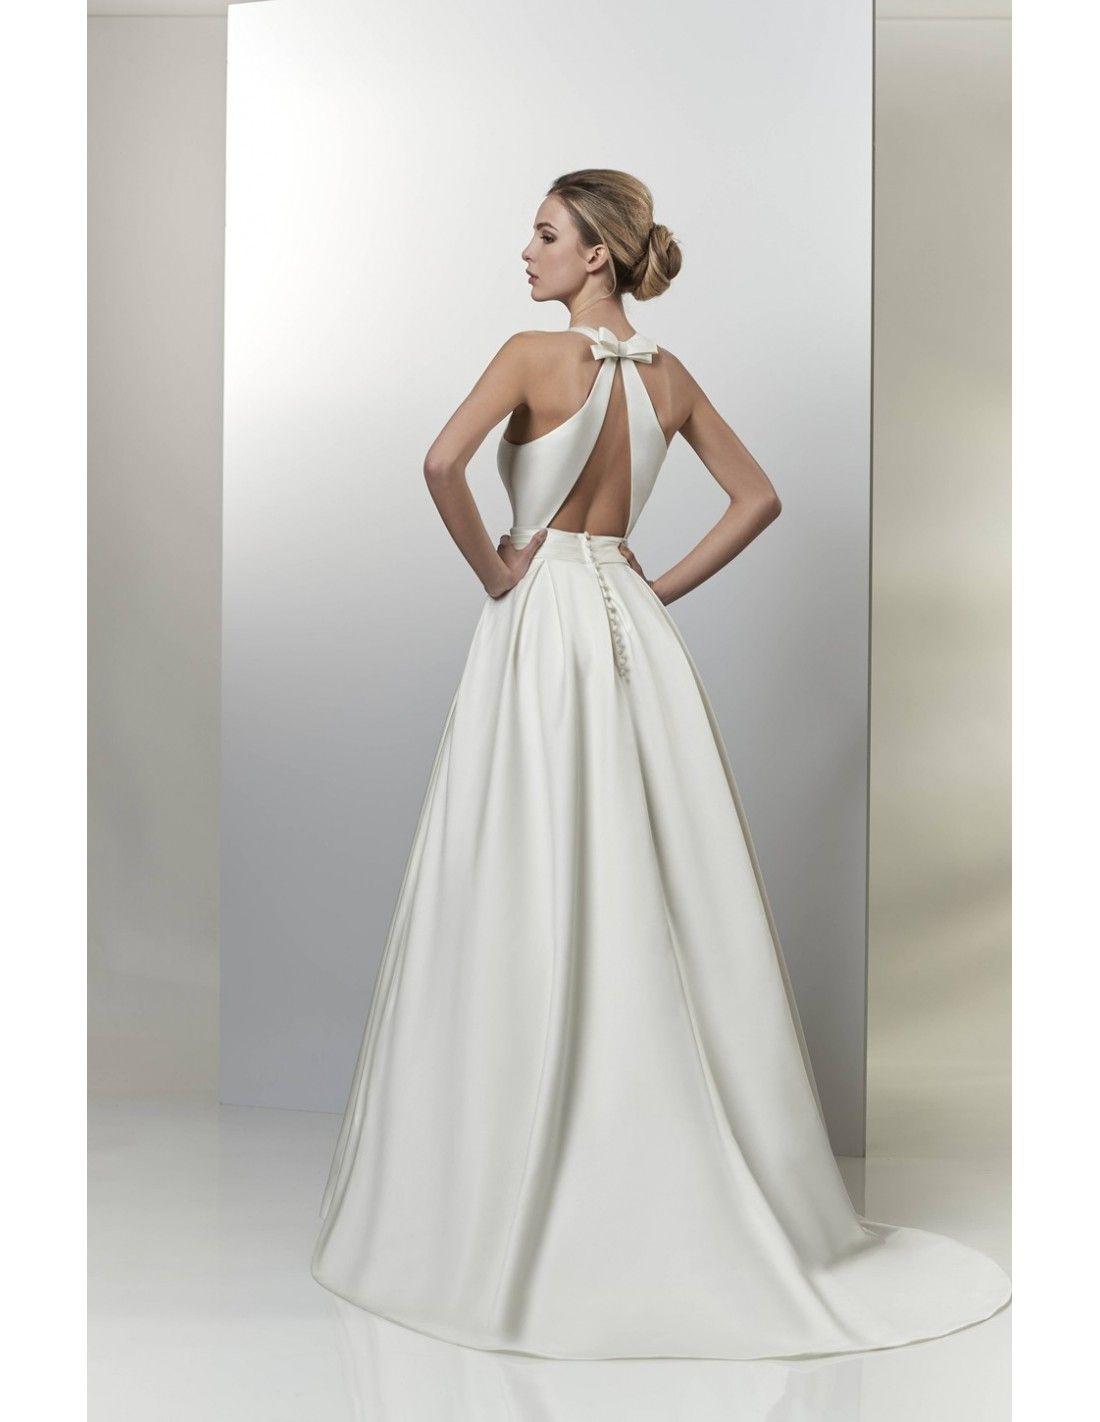 Luxurious satin ballgown available at Spotlight Formal Wear! #SpotlightBridal